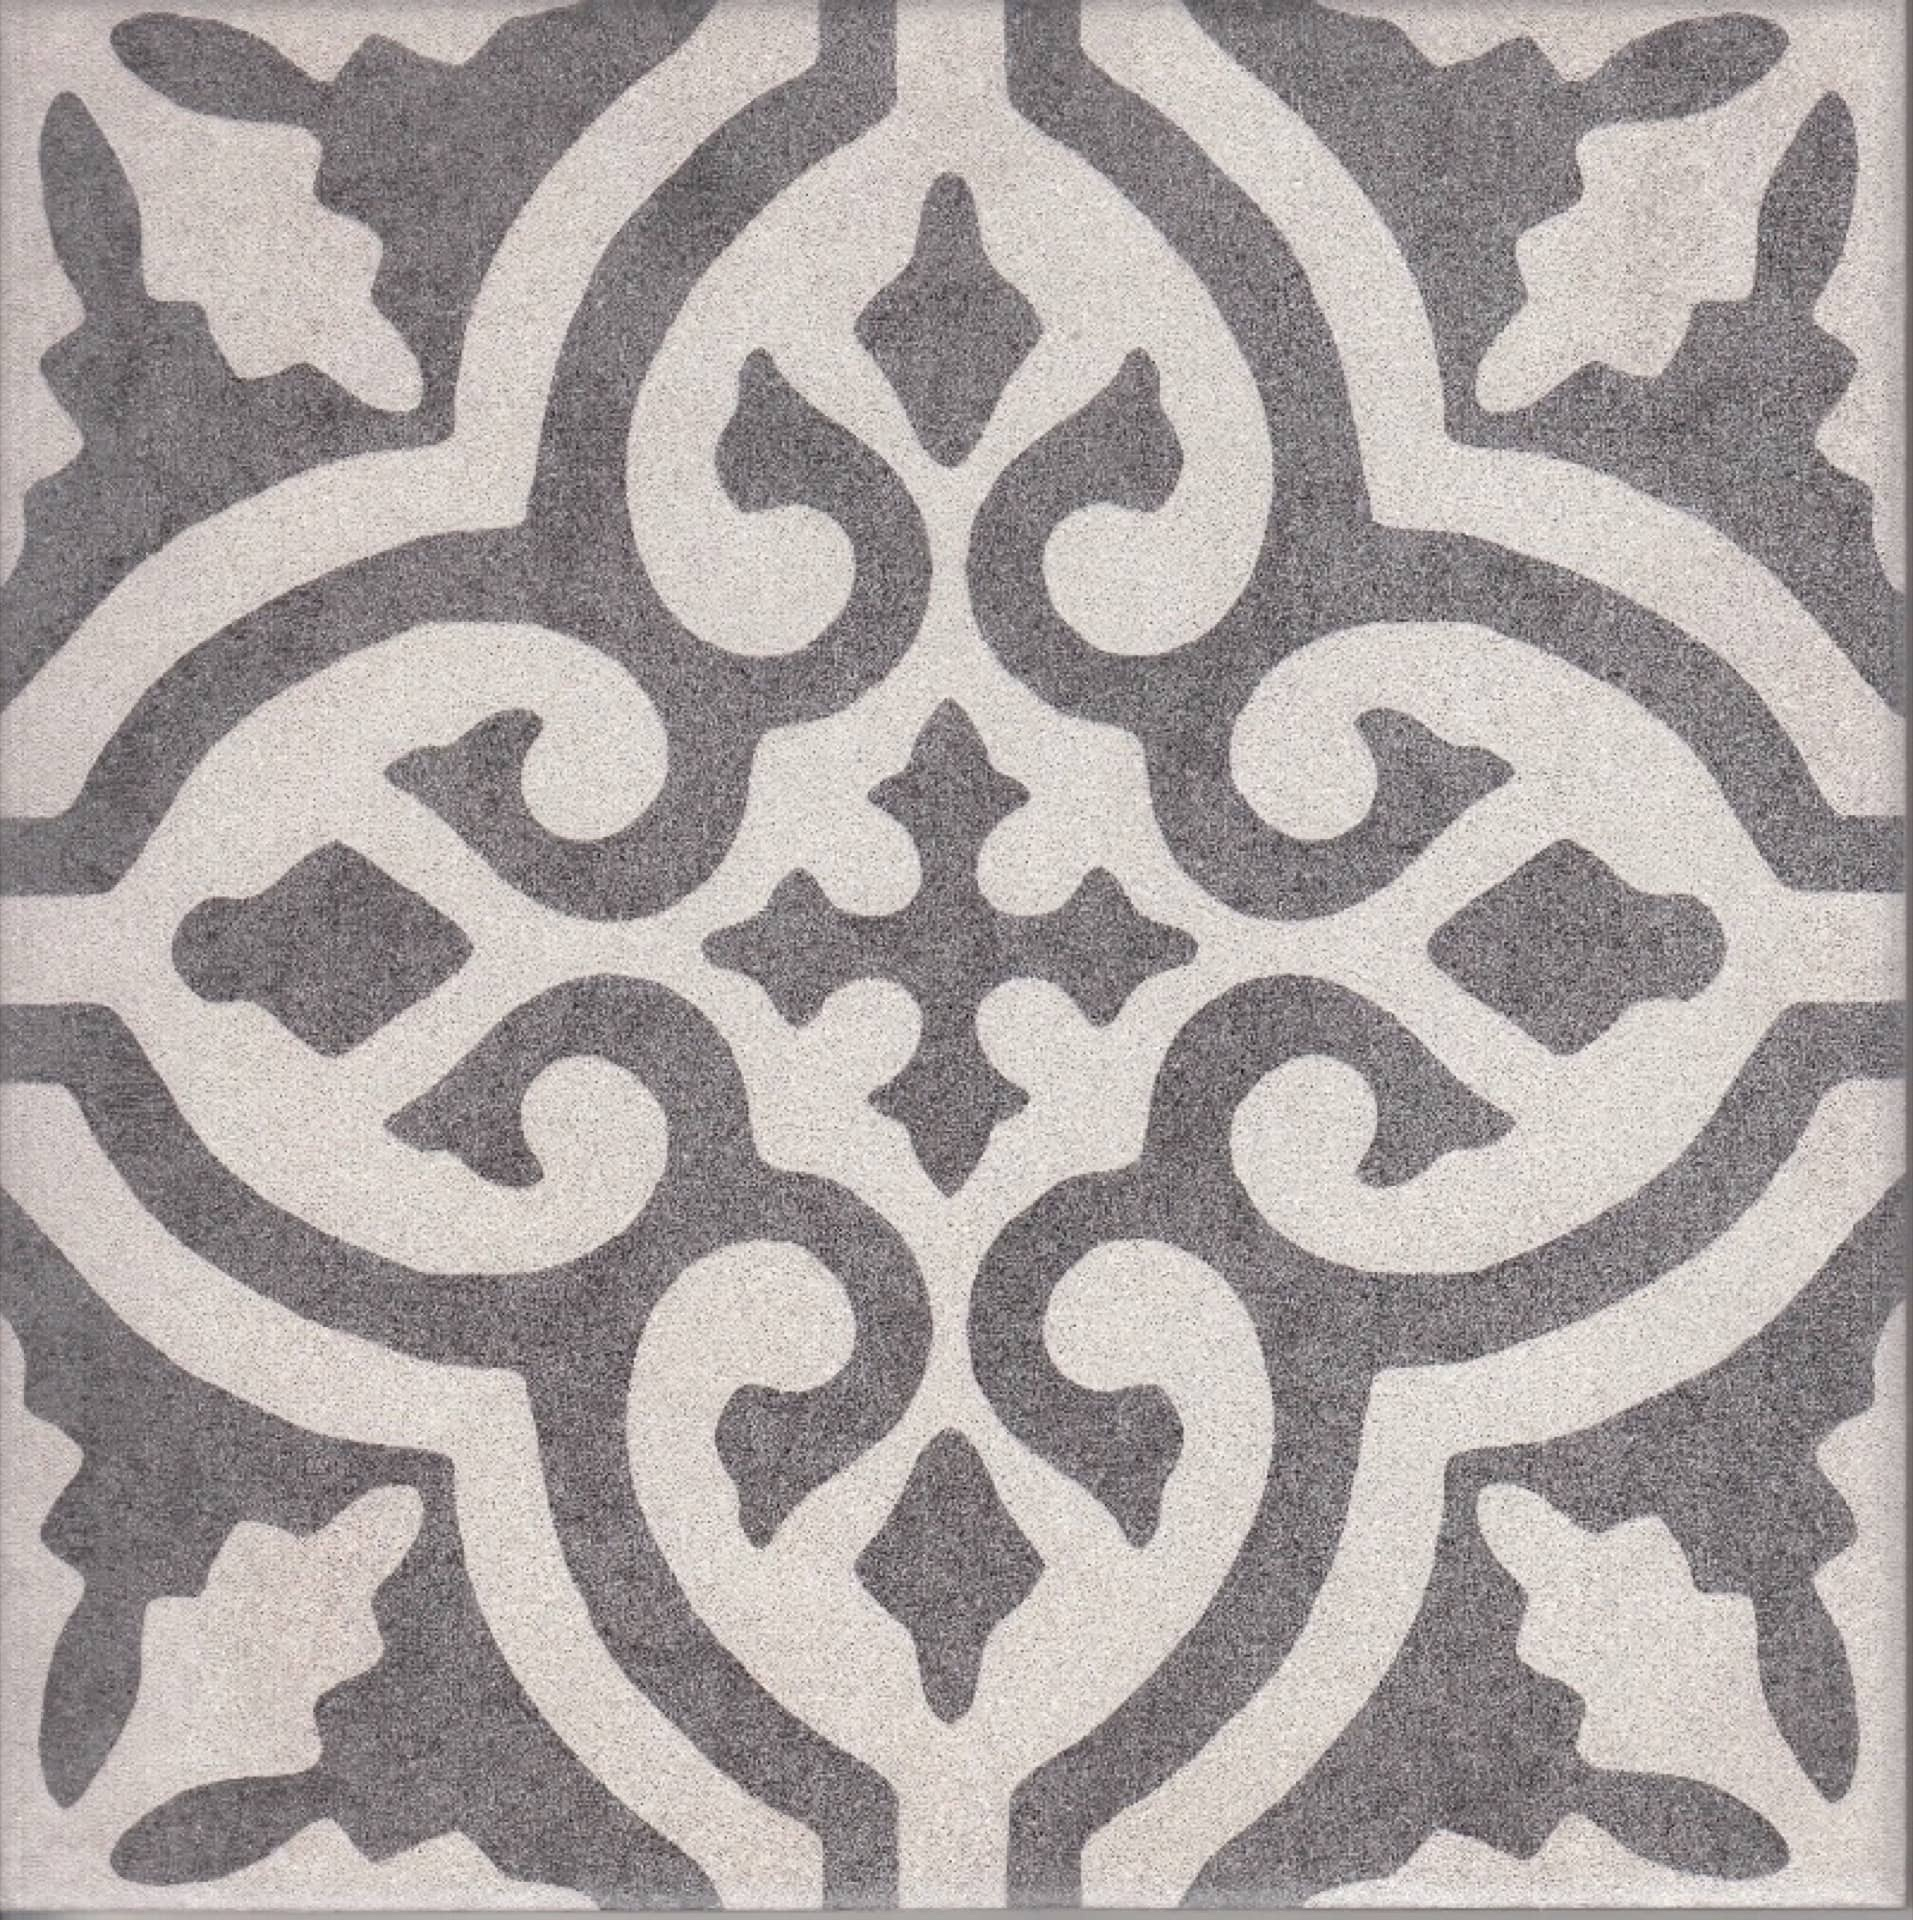 Carnaby Street Pattern_1583